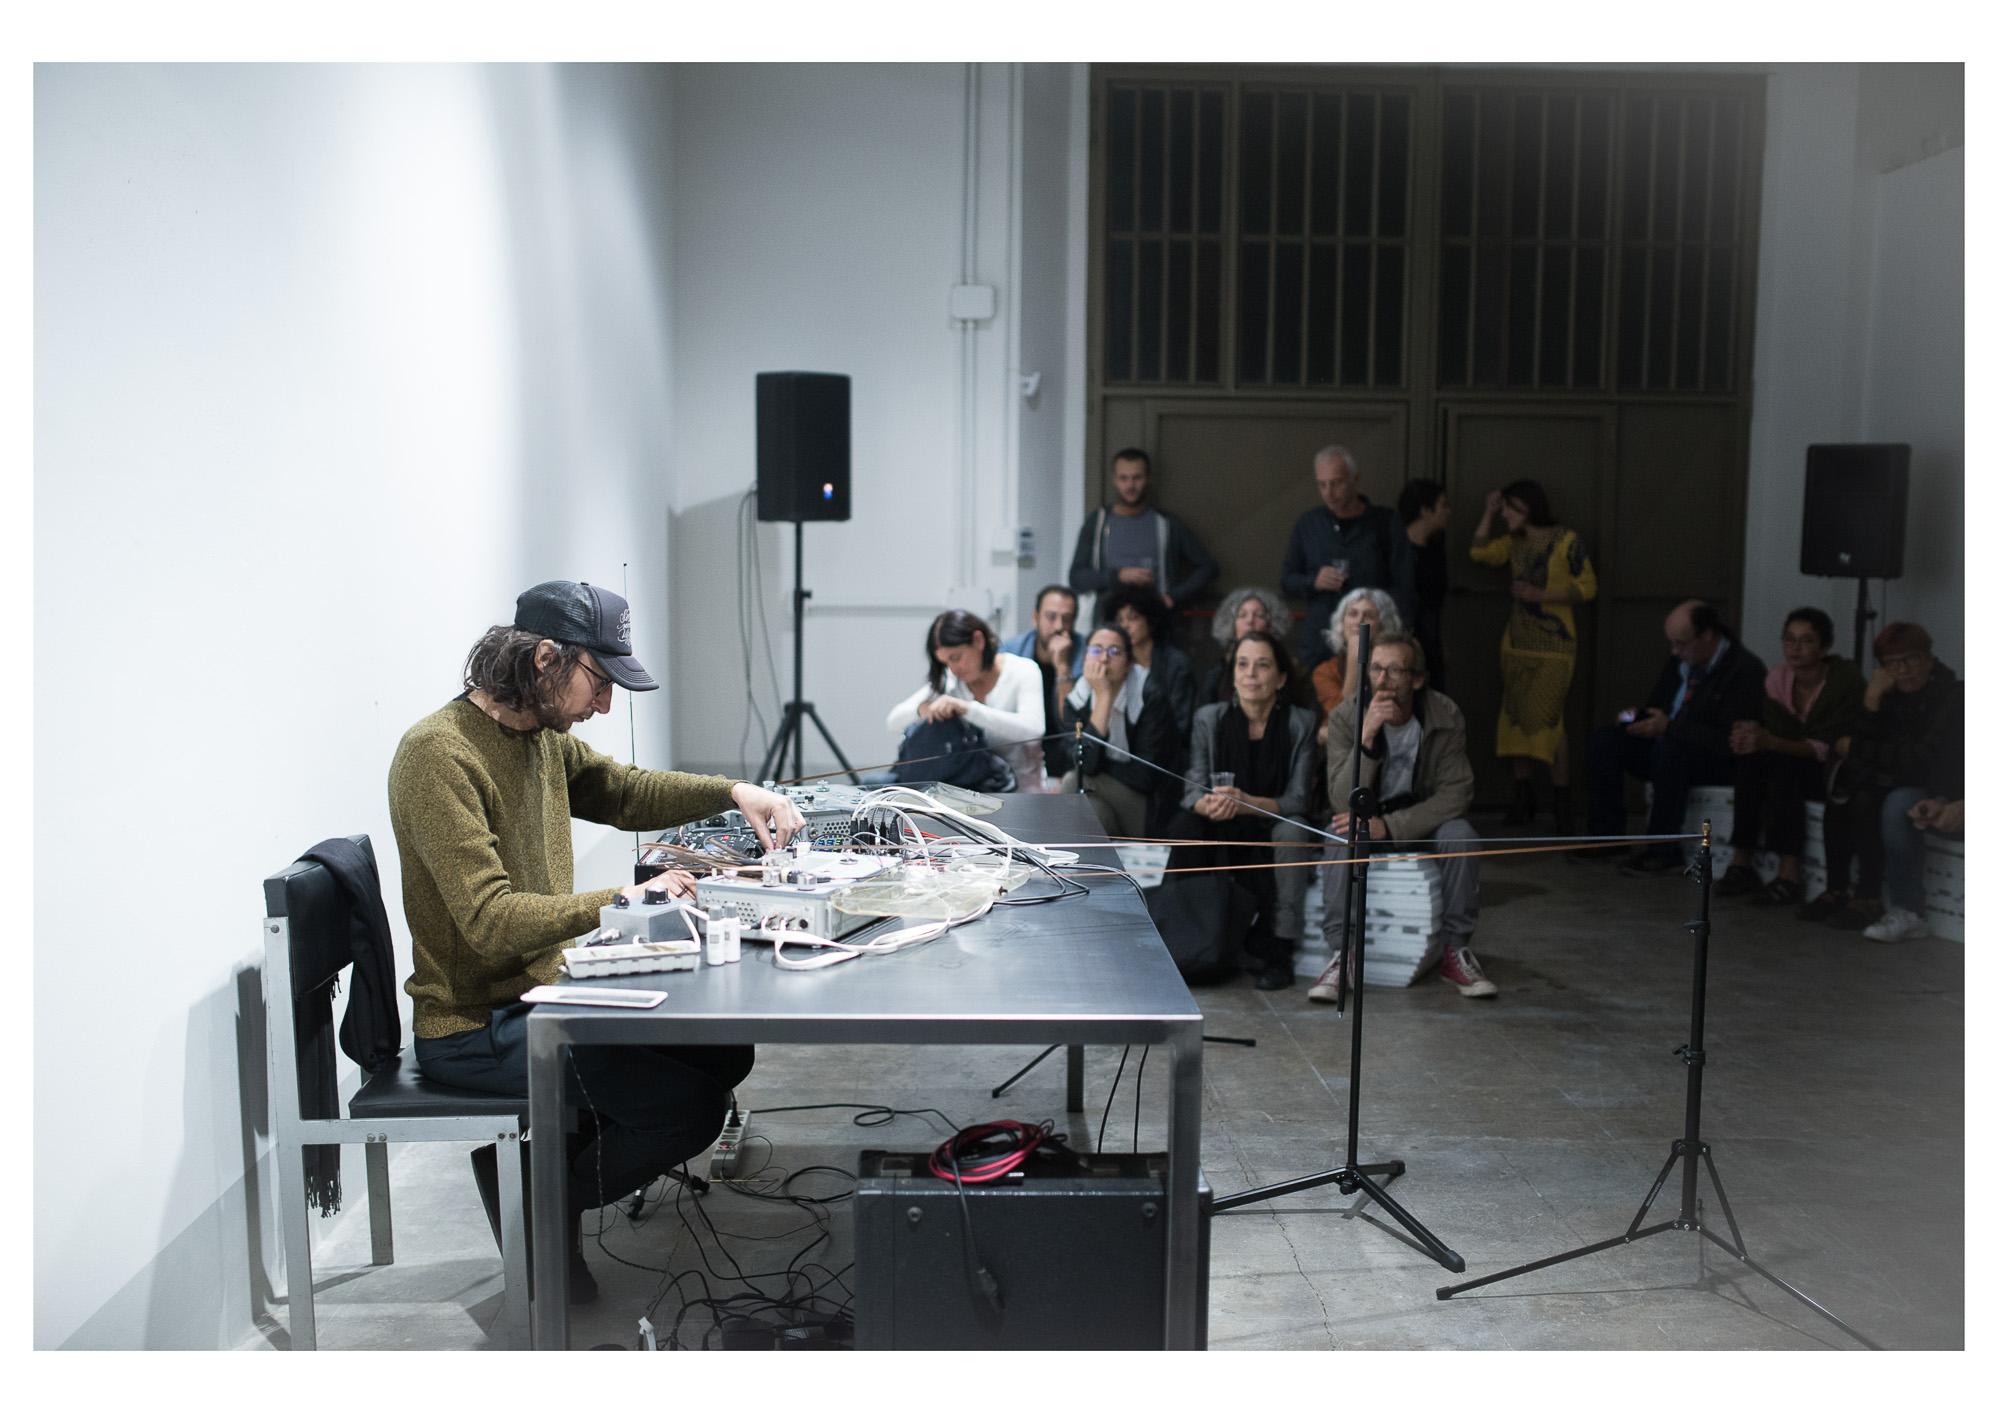 Performance by sound artist Giovanni Lami. Photo: Rachele Salvioli